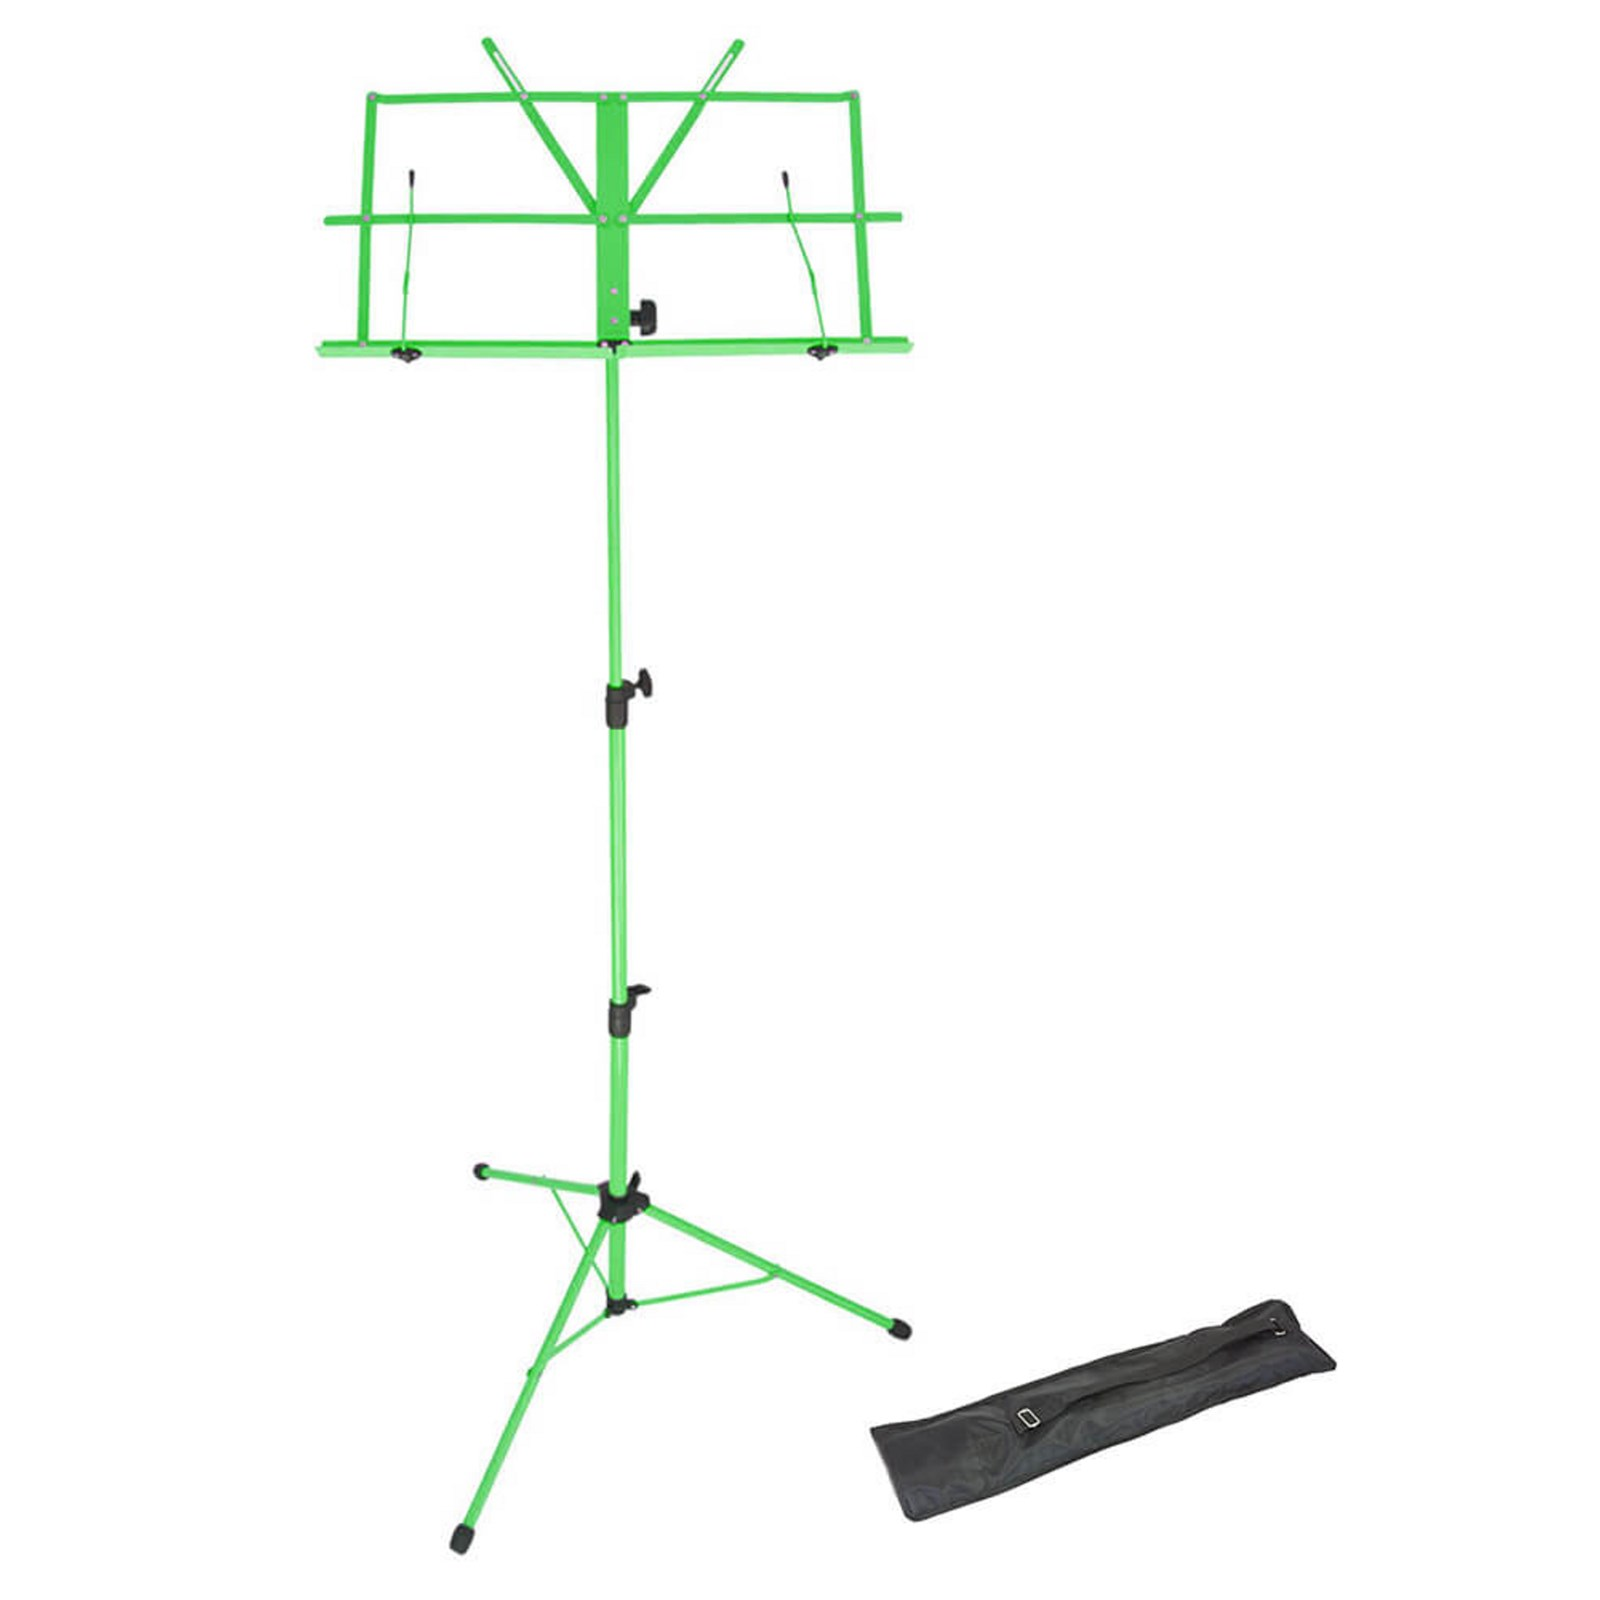 Foldaway Adjustable Music Stand - Green